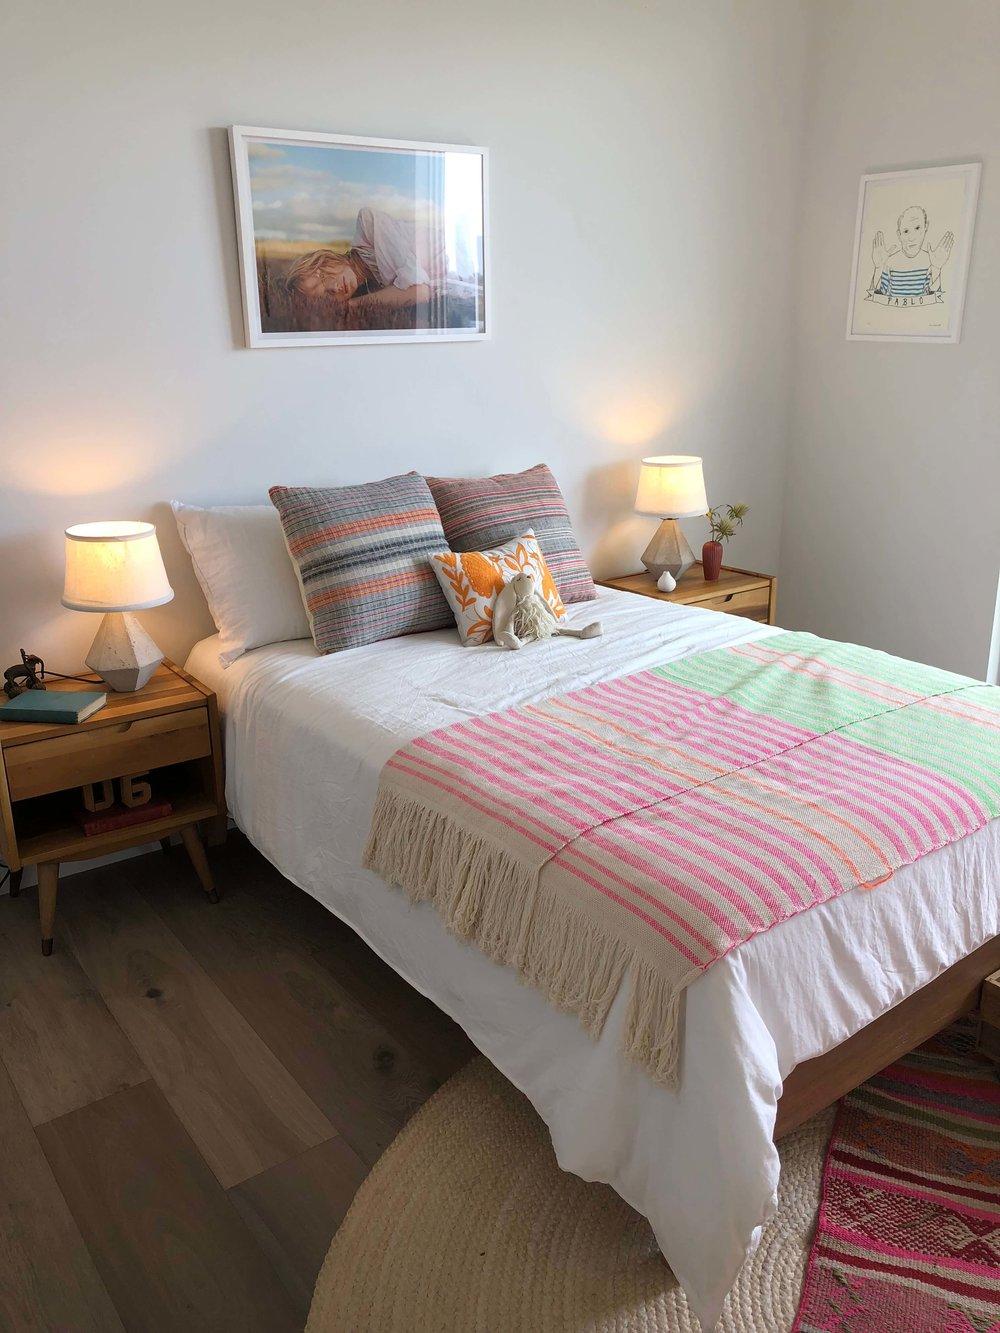 Girl's bedroom with a boho vibe | California home tour#girlbedroom